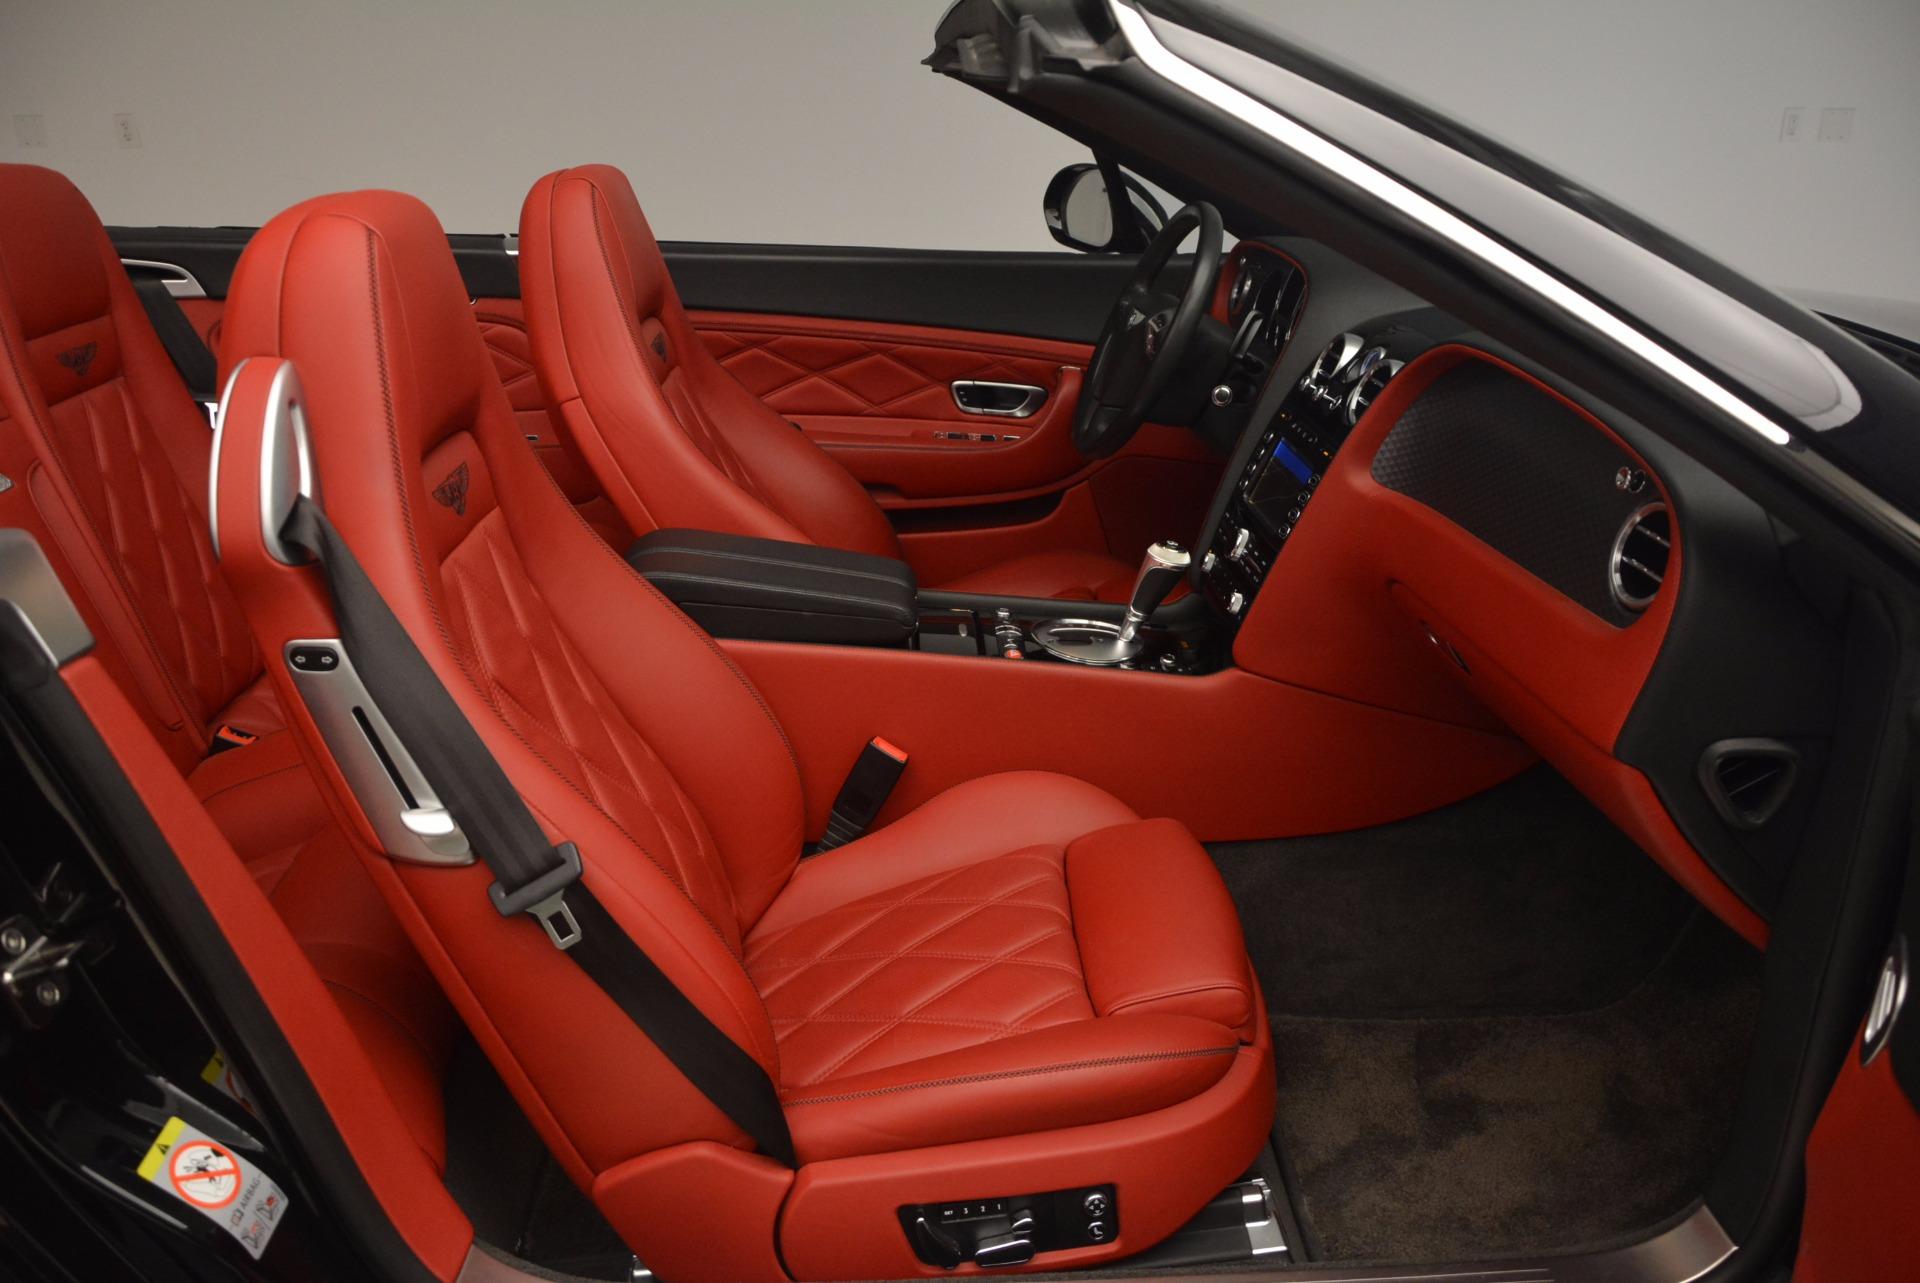 Used 2010 Bentley Continental GT Speed For Sale In Westport, CT 1298_p42